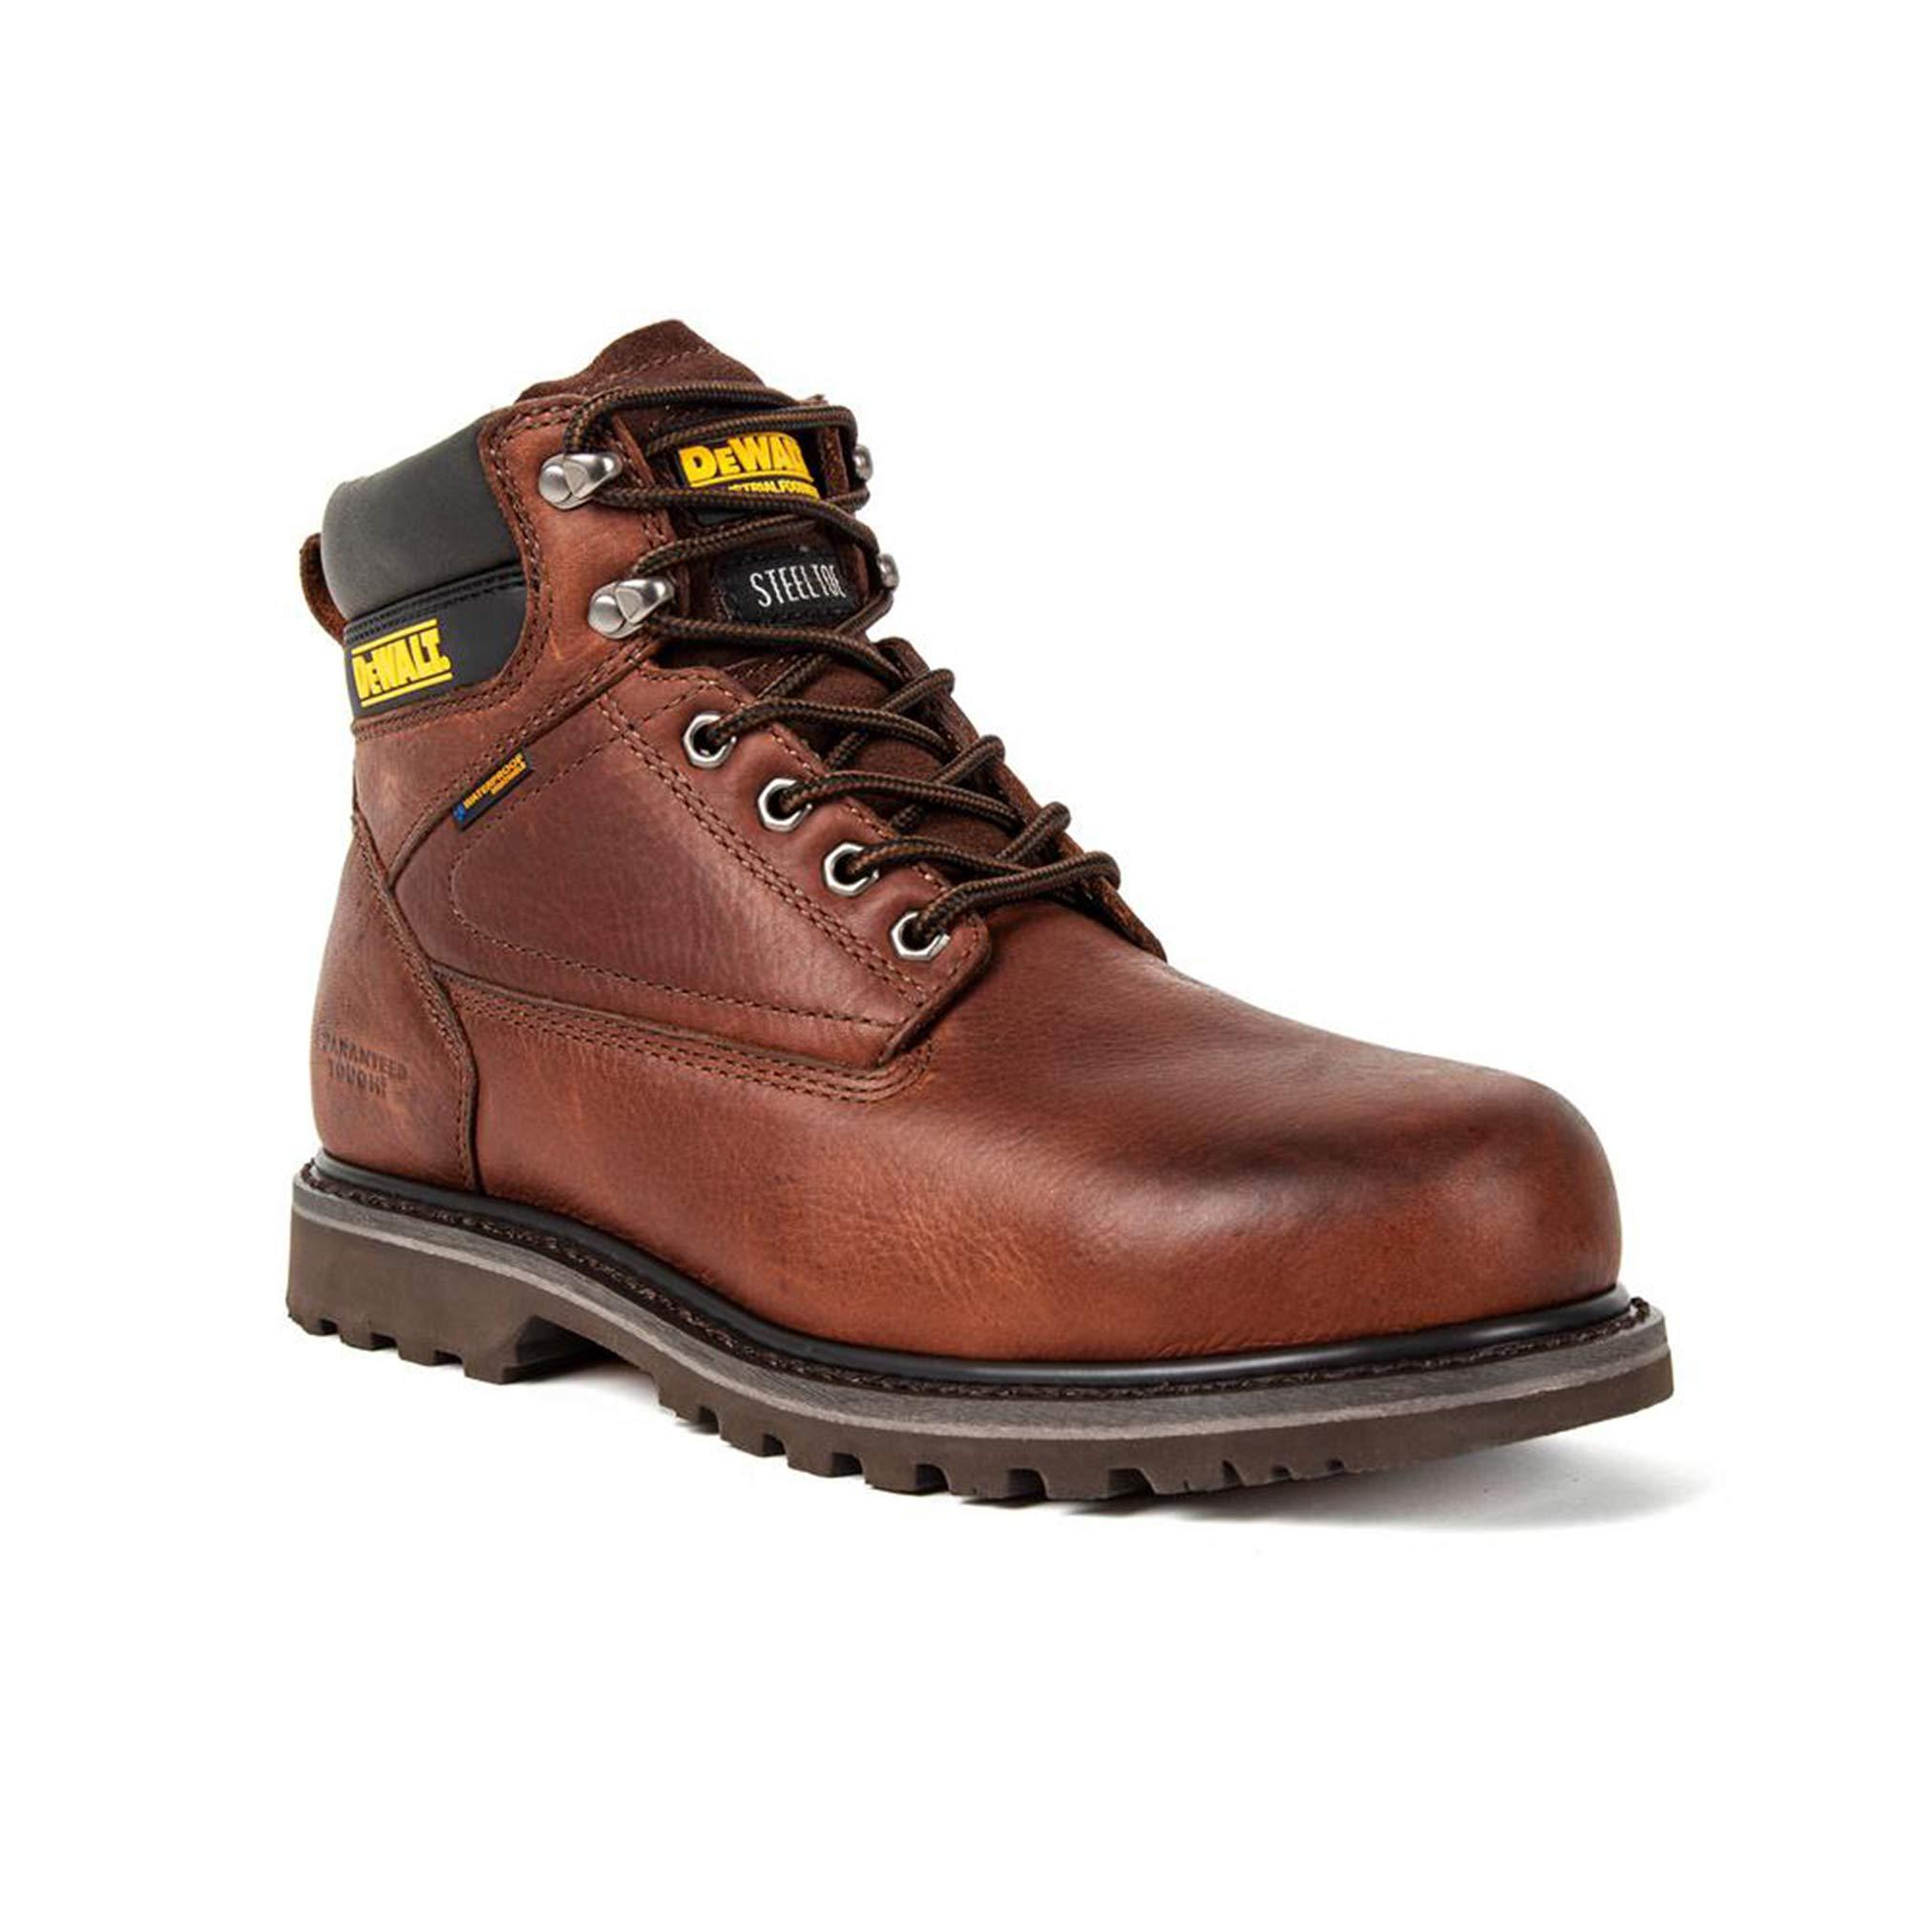 DEWALT Men's Axle Steel Toe Waterproof Work Boot (10 M US)